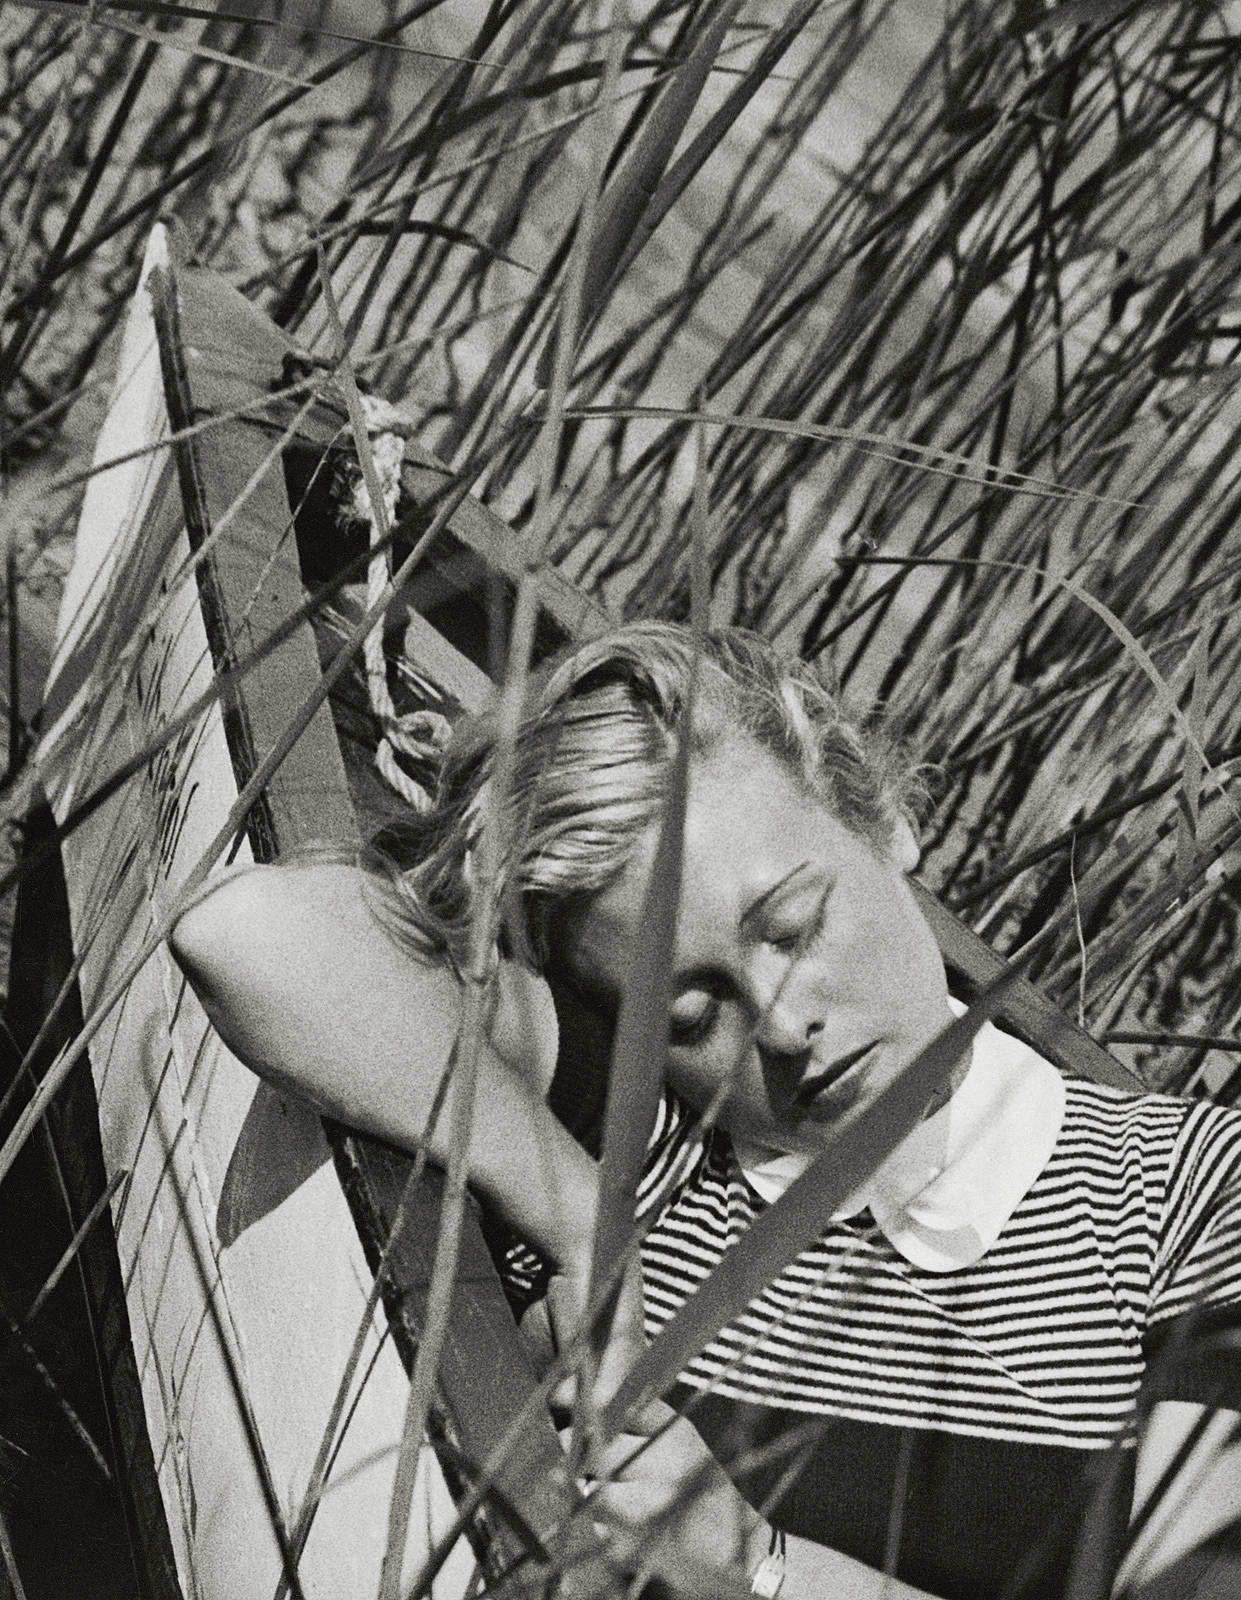 Martin Munkácsi :: Erika Fiedler in the Reeds, 1934 / more [+] M. Munkácsi